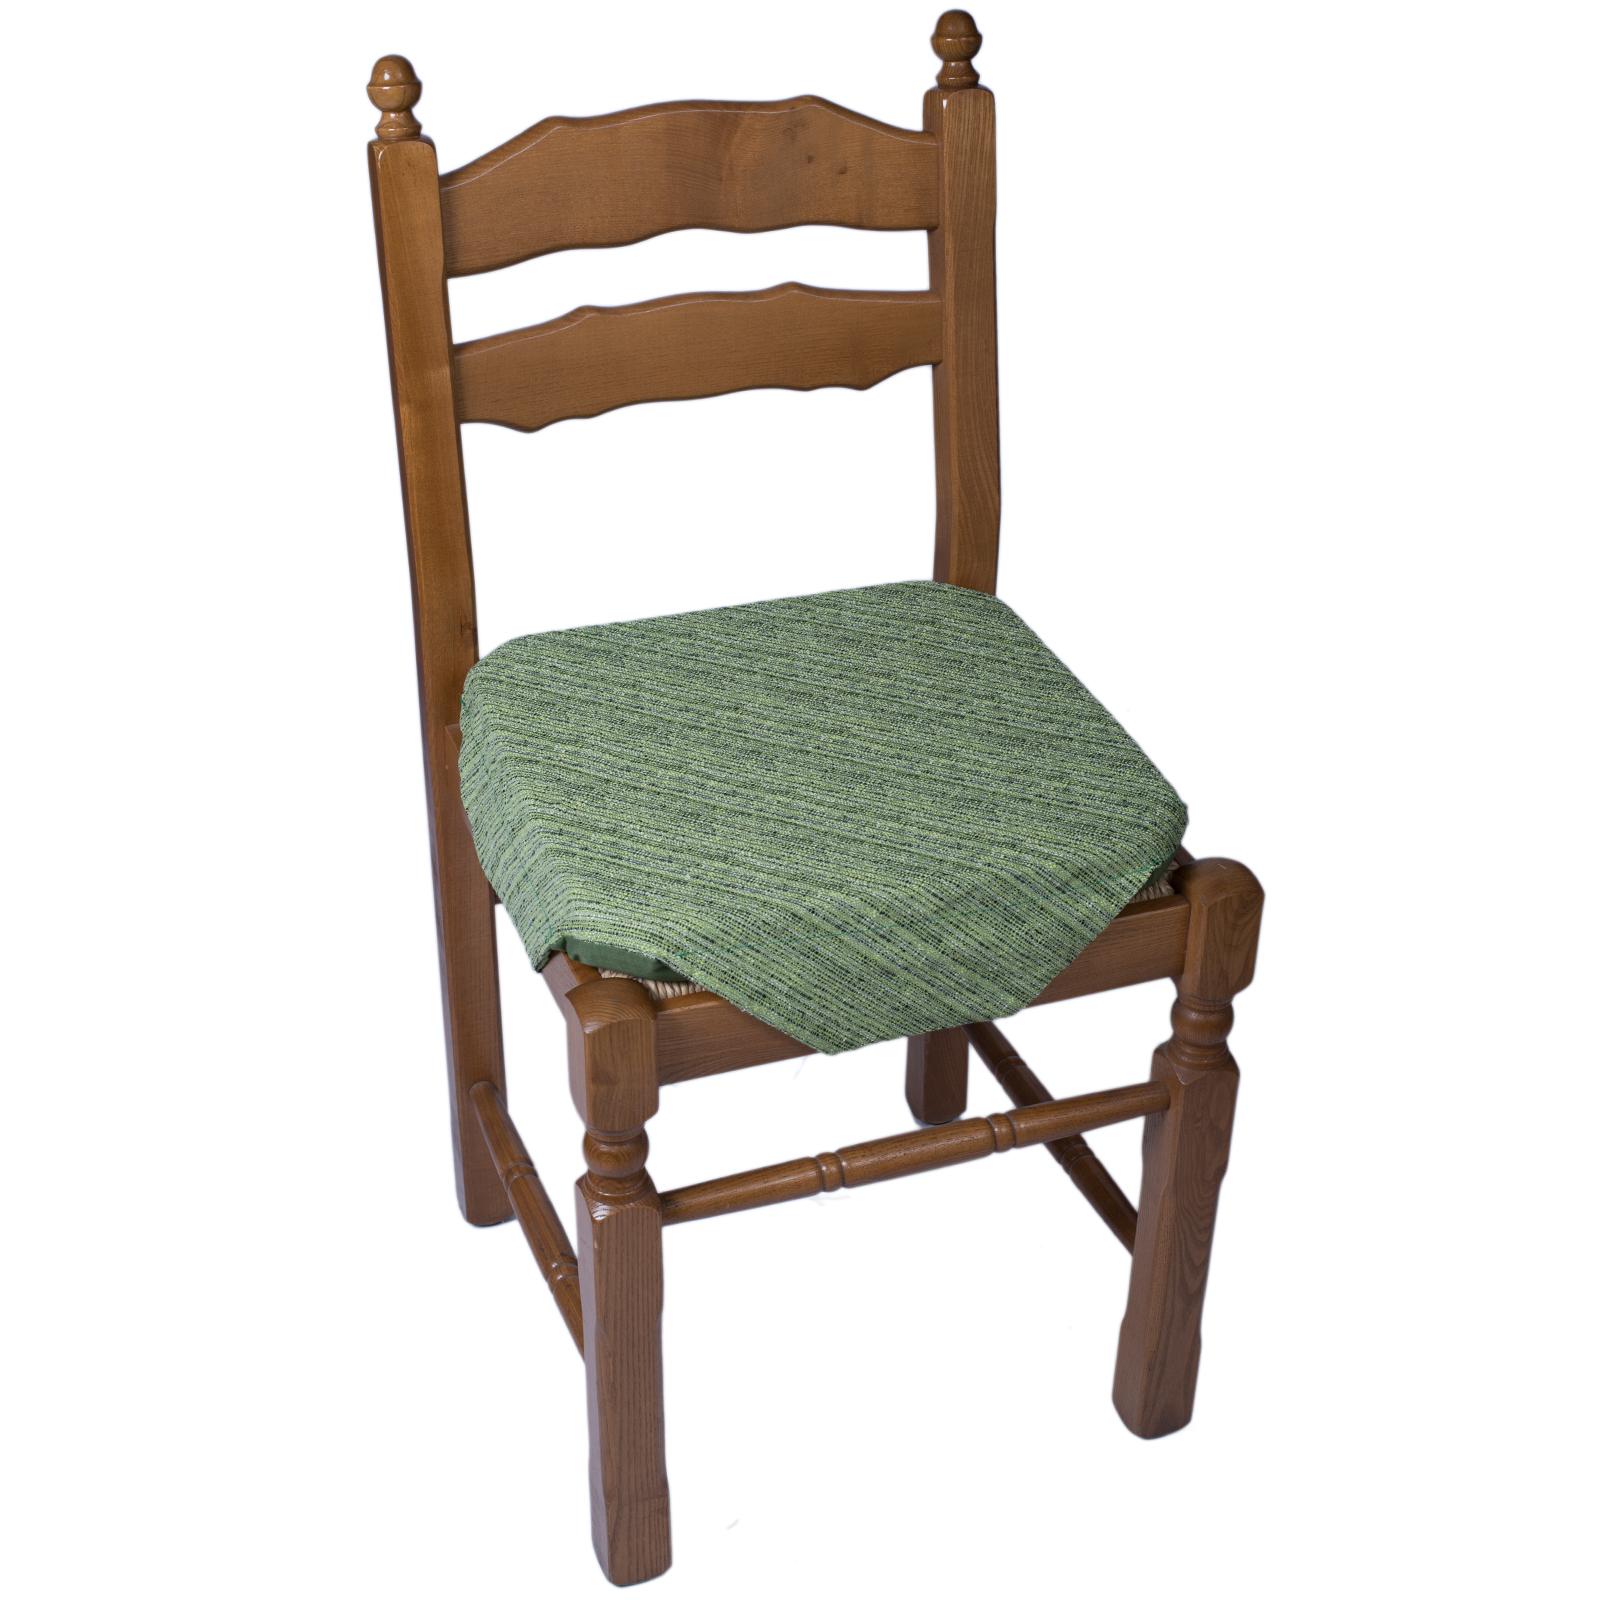 Cuscino sedia alette melange verde cose di casa un - Cose di casa mondovi ...